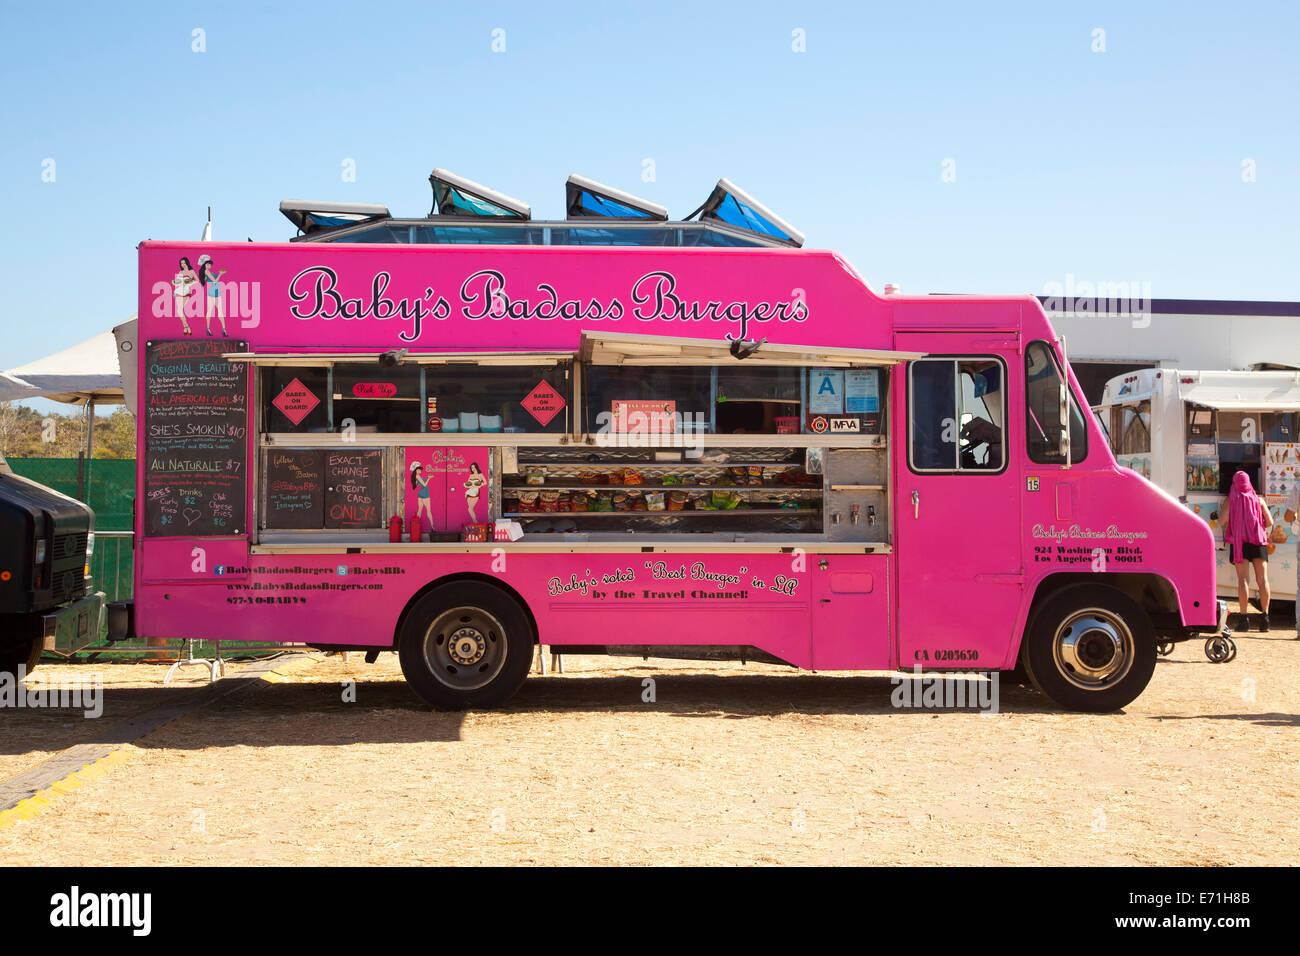 Texas Bbq Food Truck Los Angeles